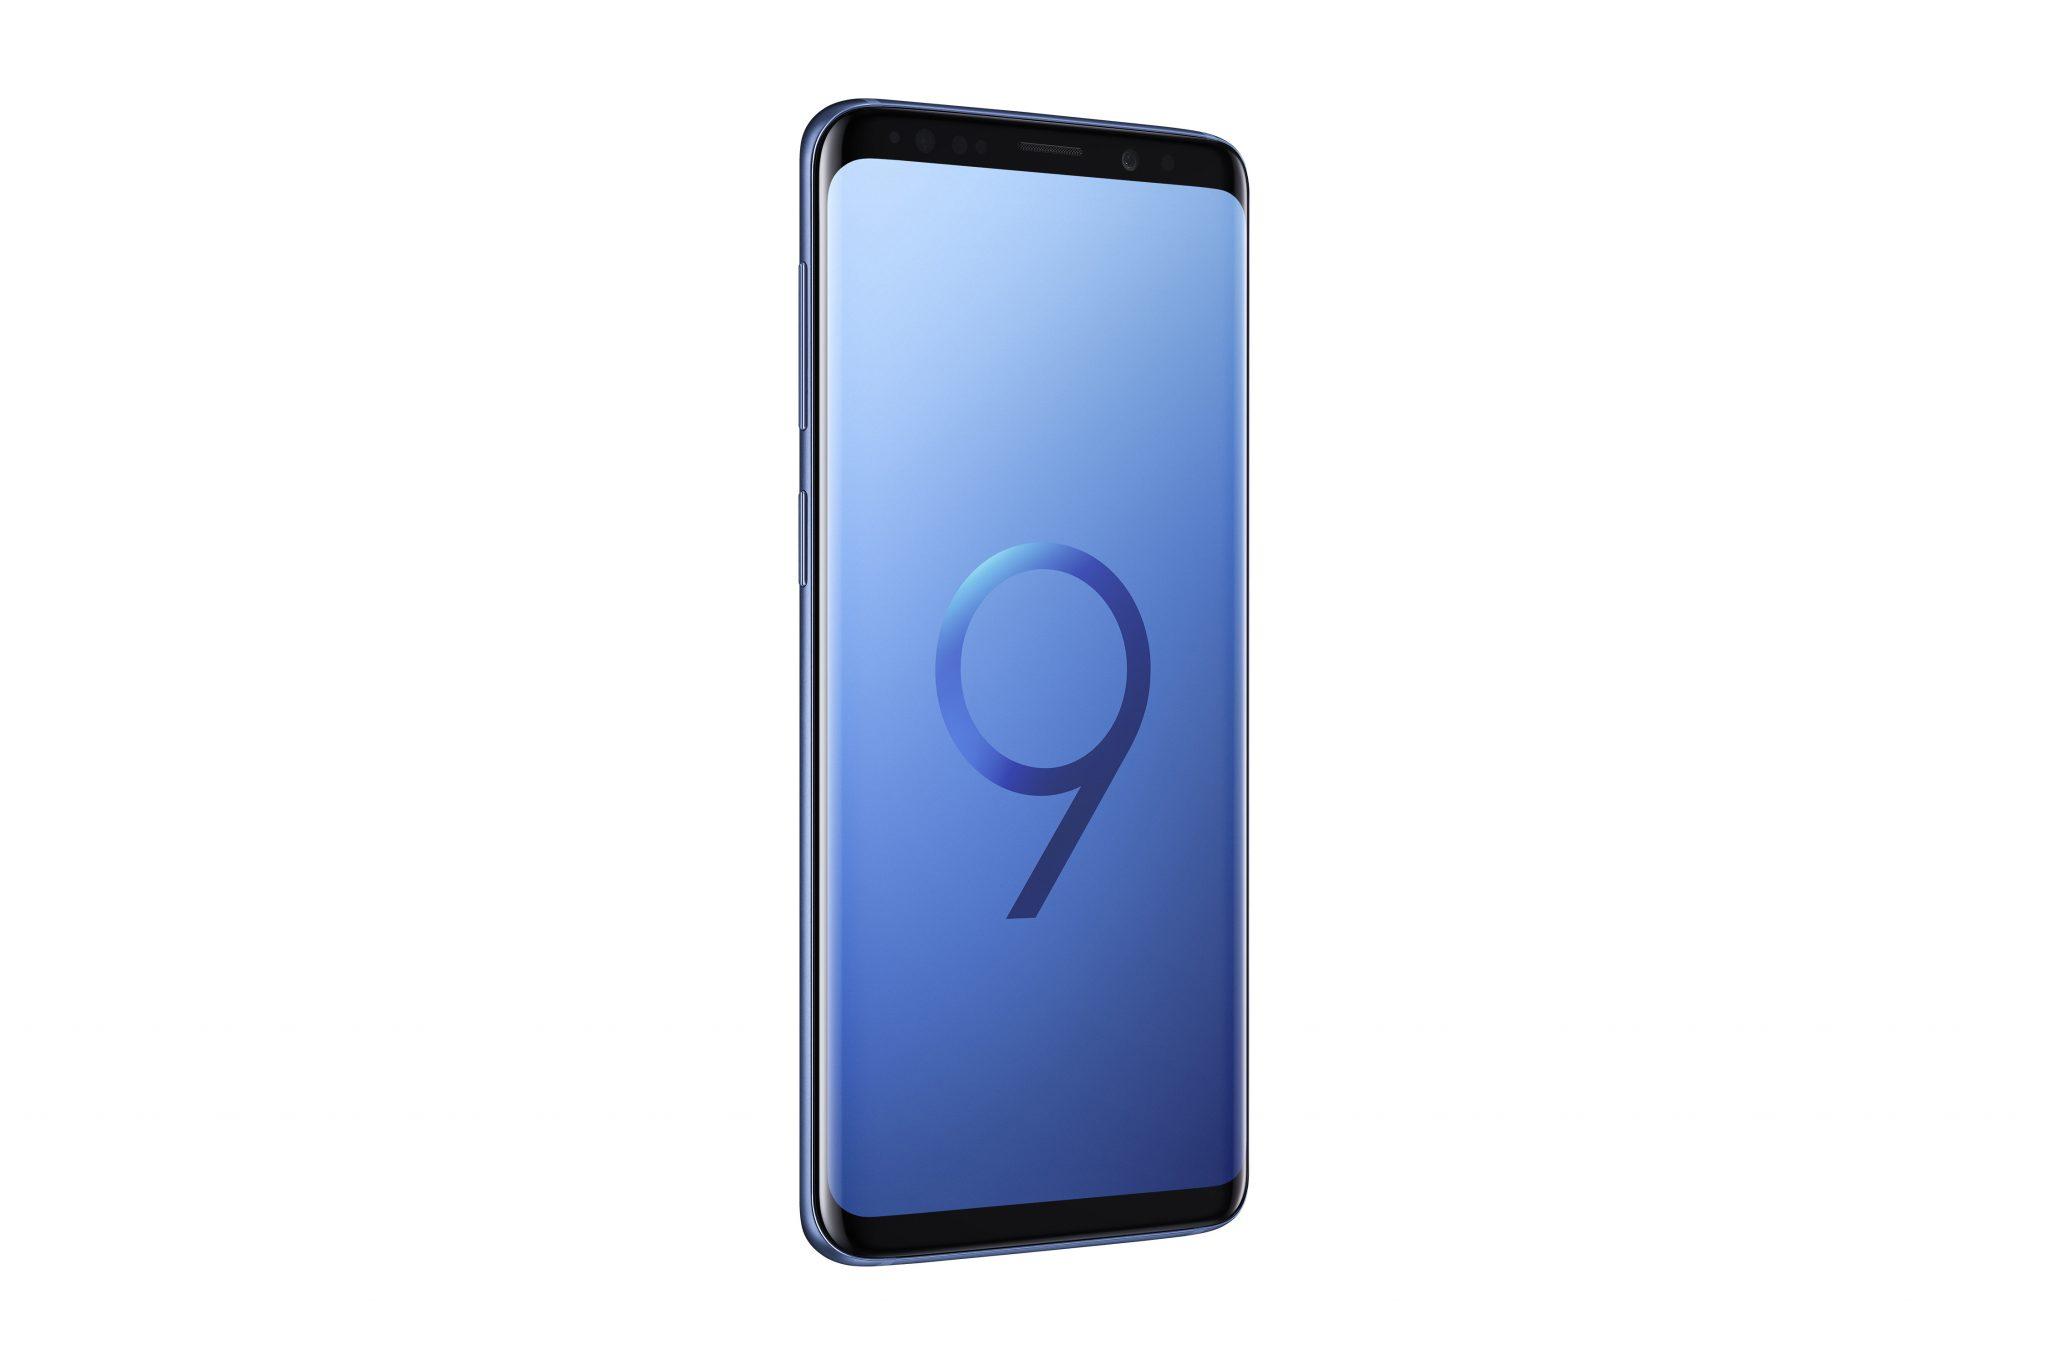 SM G960 GalaxyS9 L30 Blue - SM_G960_GalaxyS9_L30_Blue